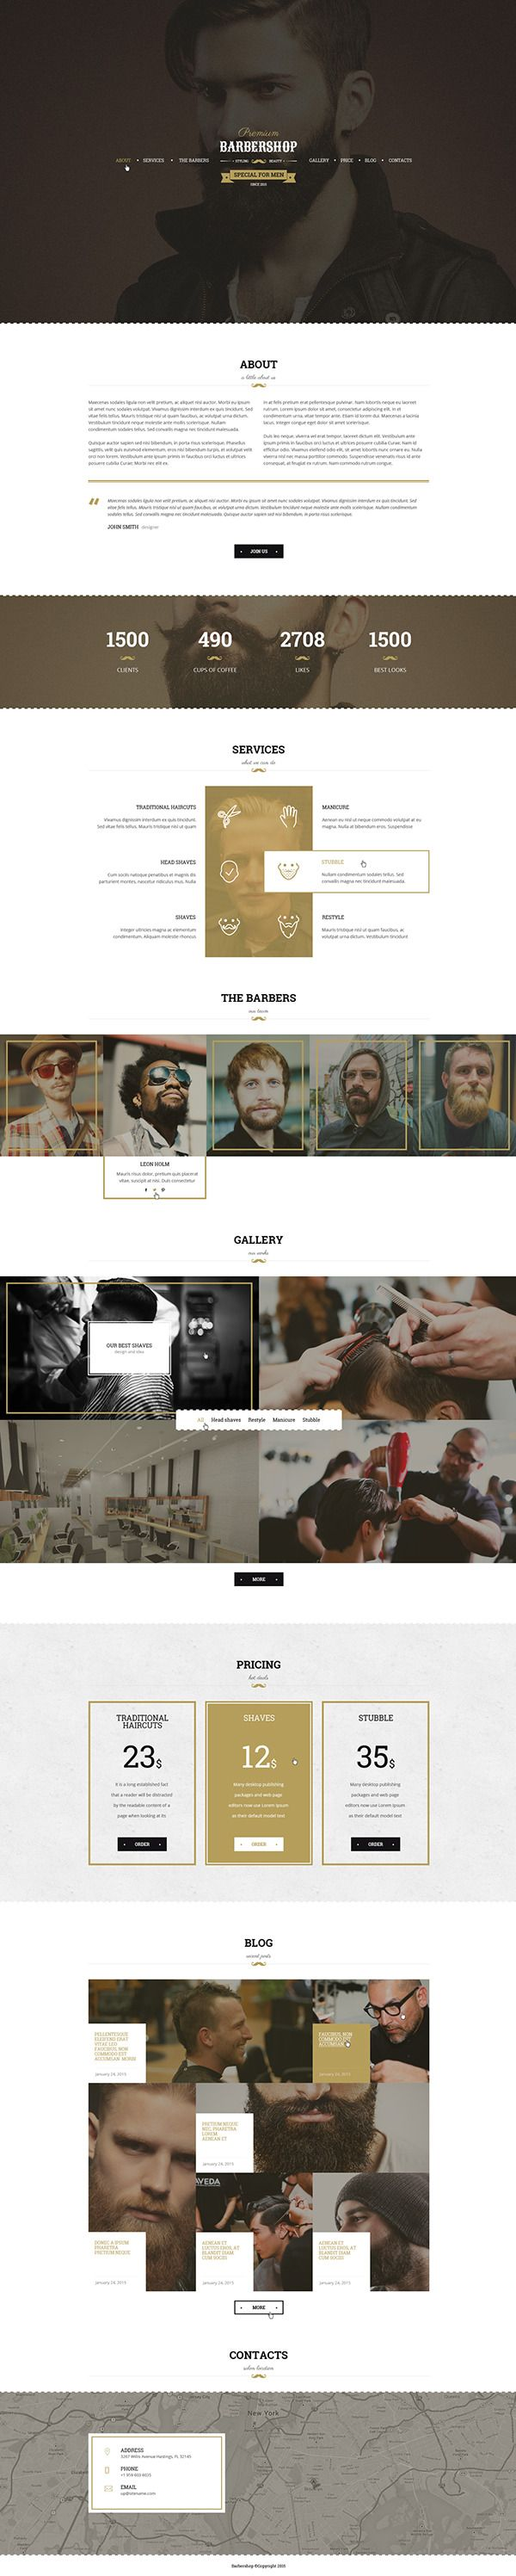 Barbershop - One Page Barbers Theme on Behance